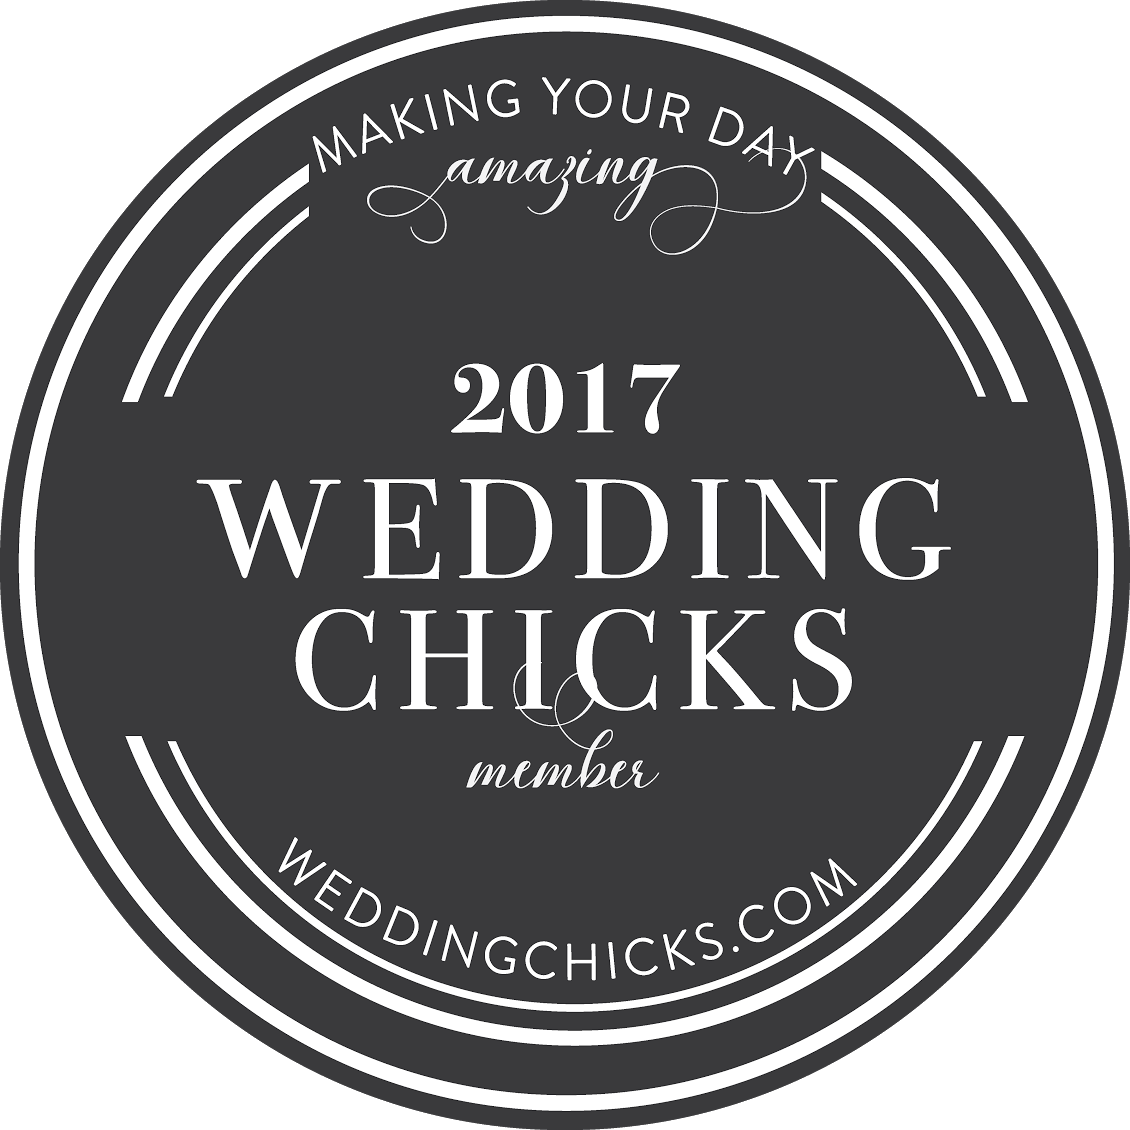 Wedding-Chicks-Member-Badge-2017.png